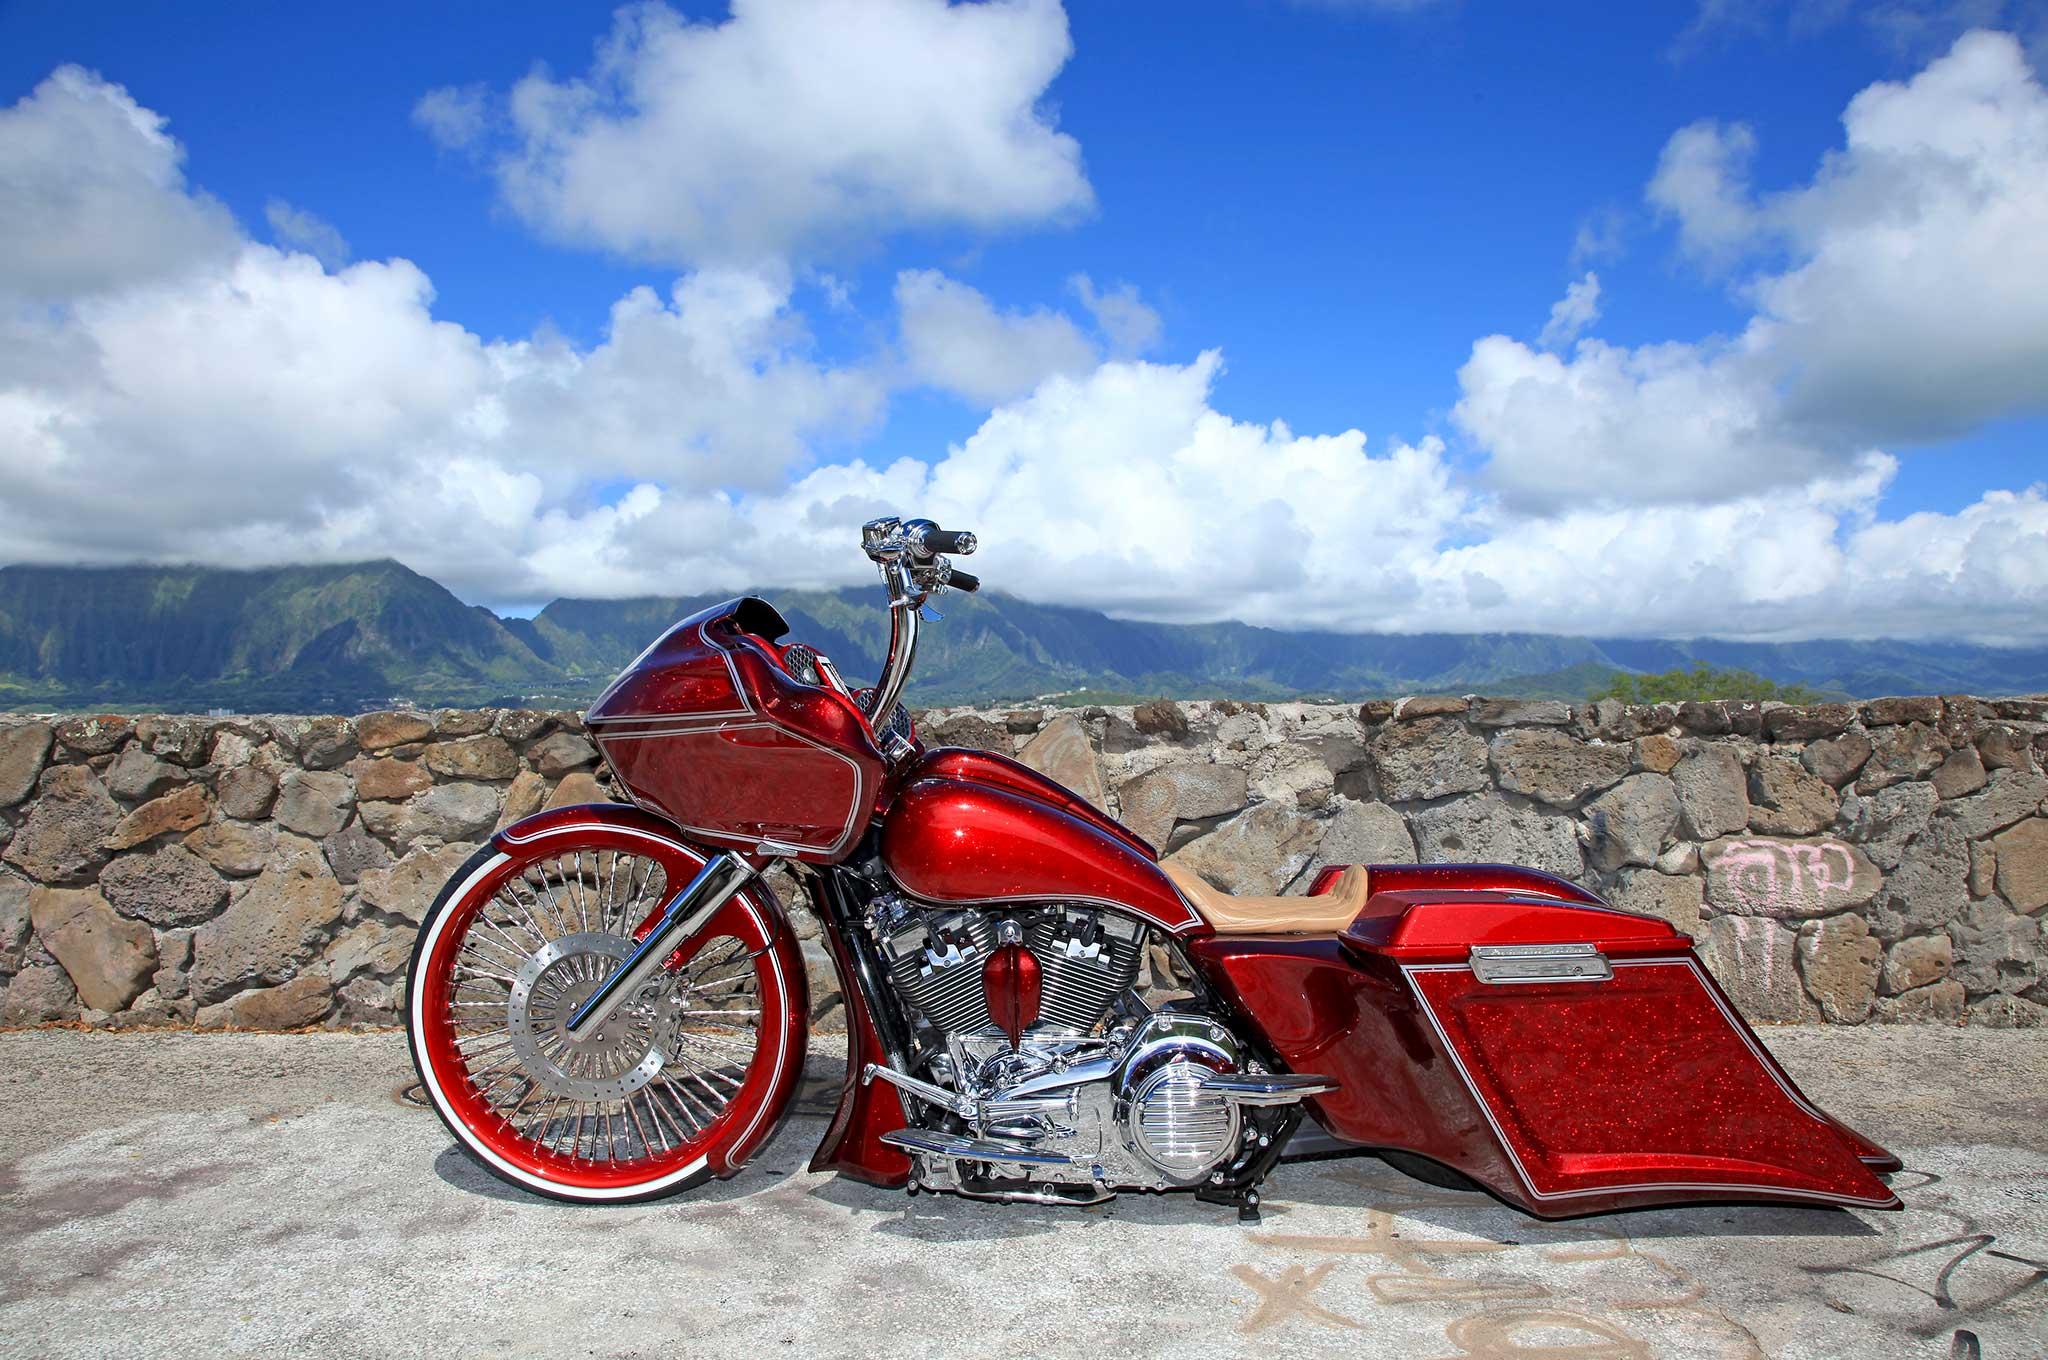 2013 Harley Davidson Road Glide Gliding In Paradise